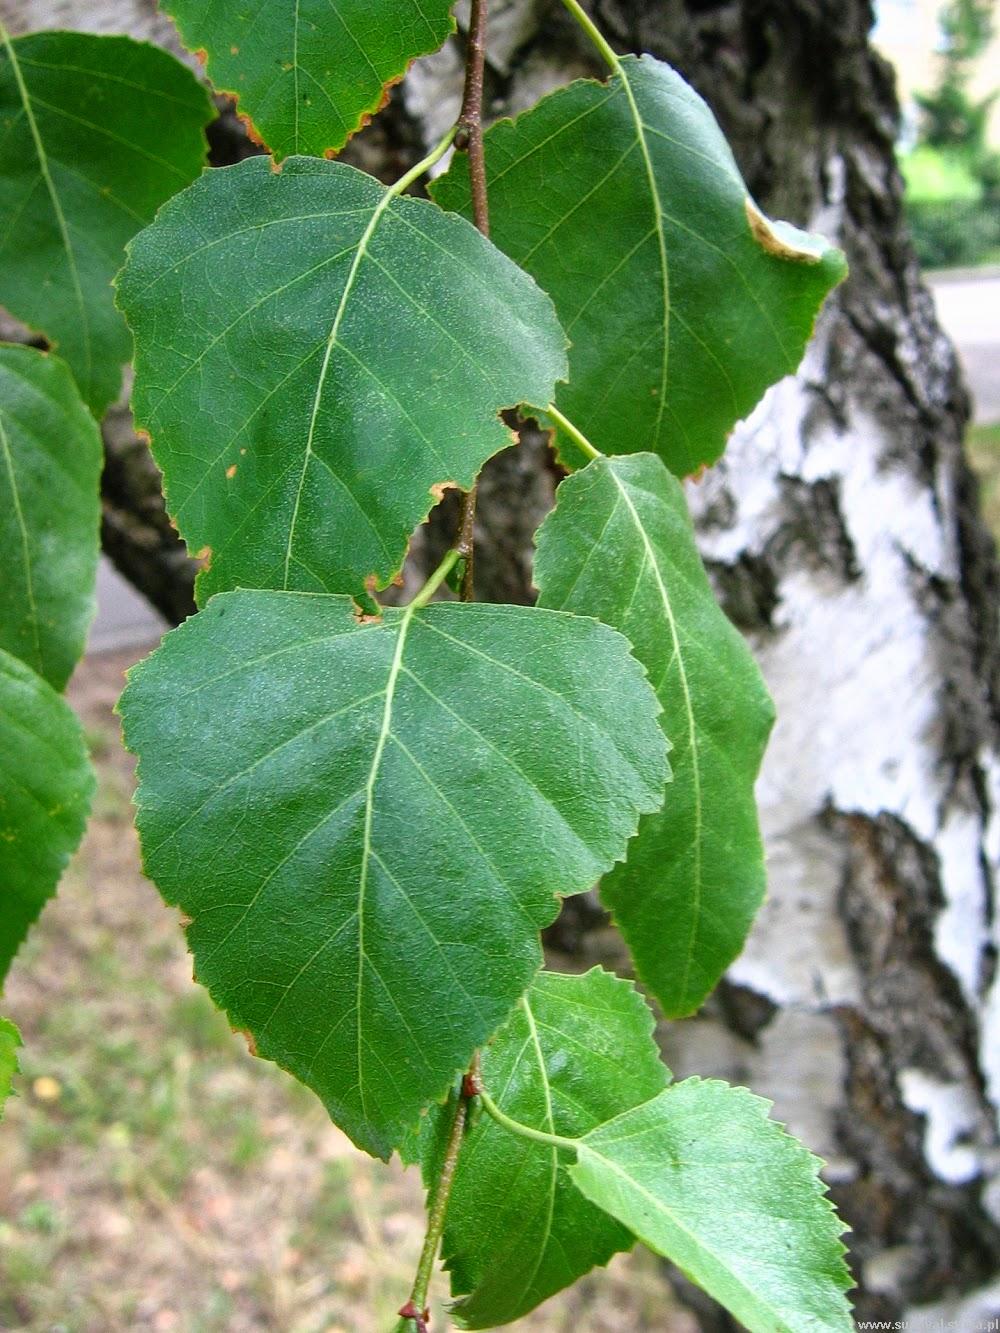 BRZOZA OMSZONA Betula pubescens